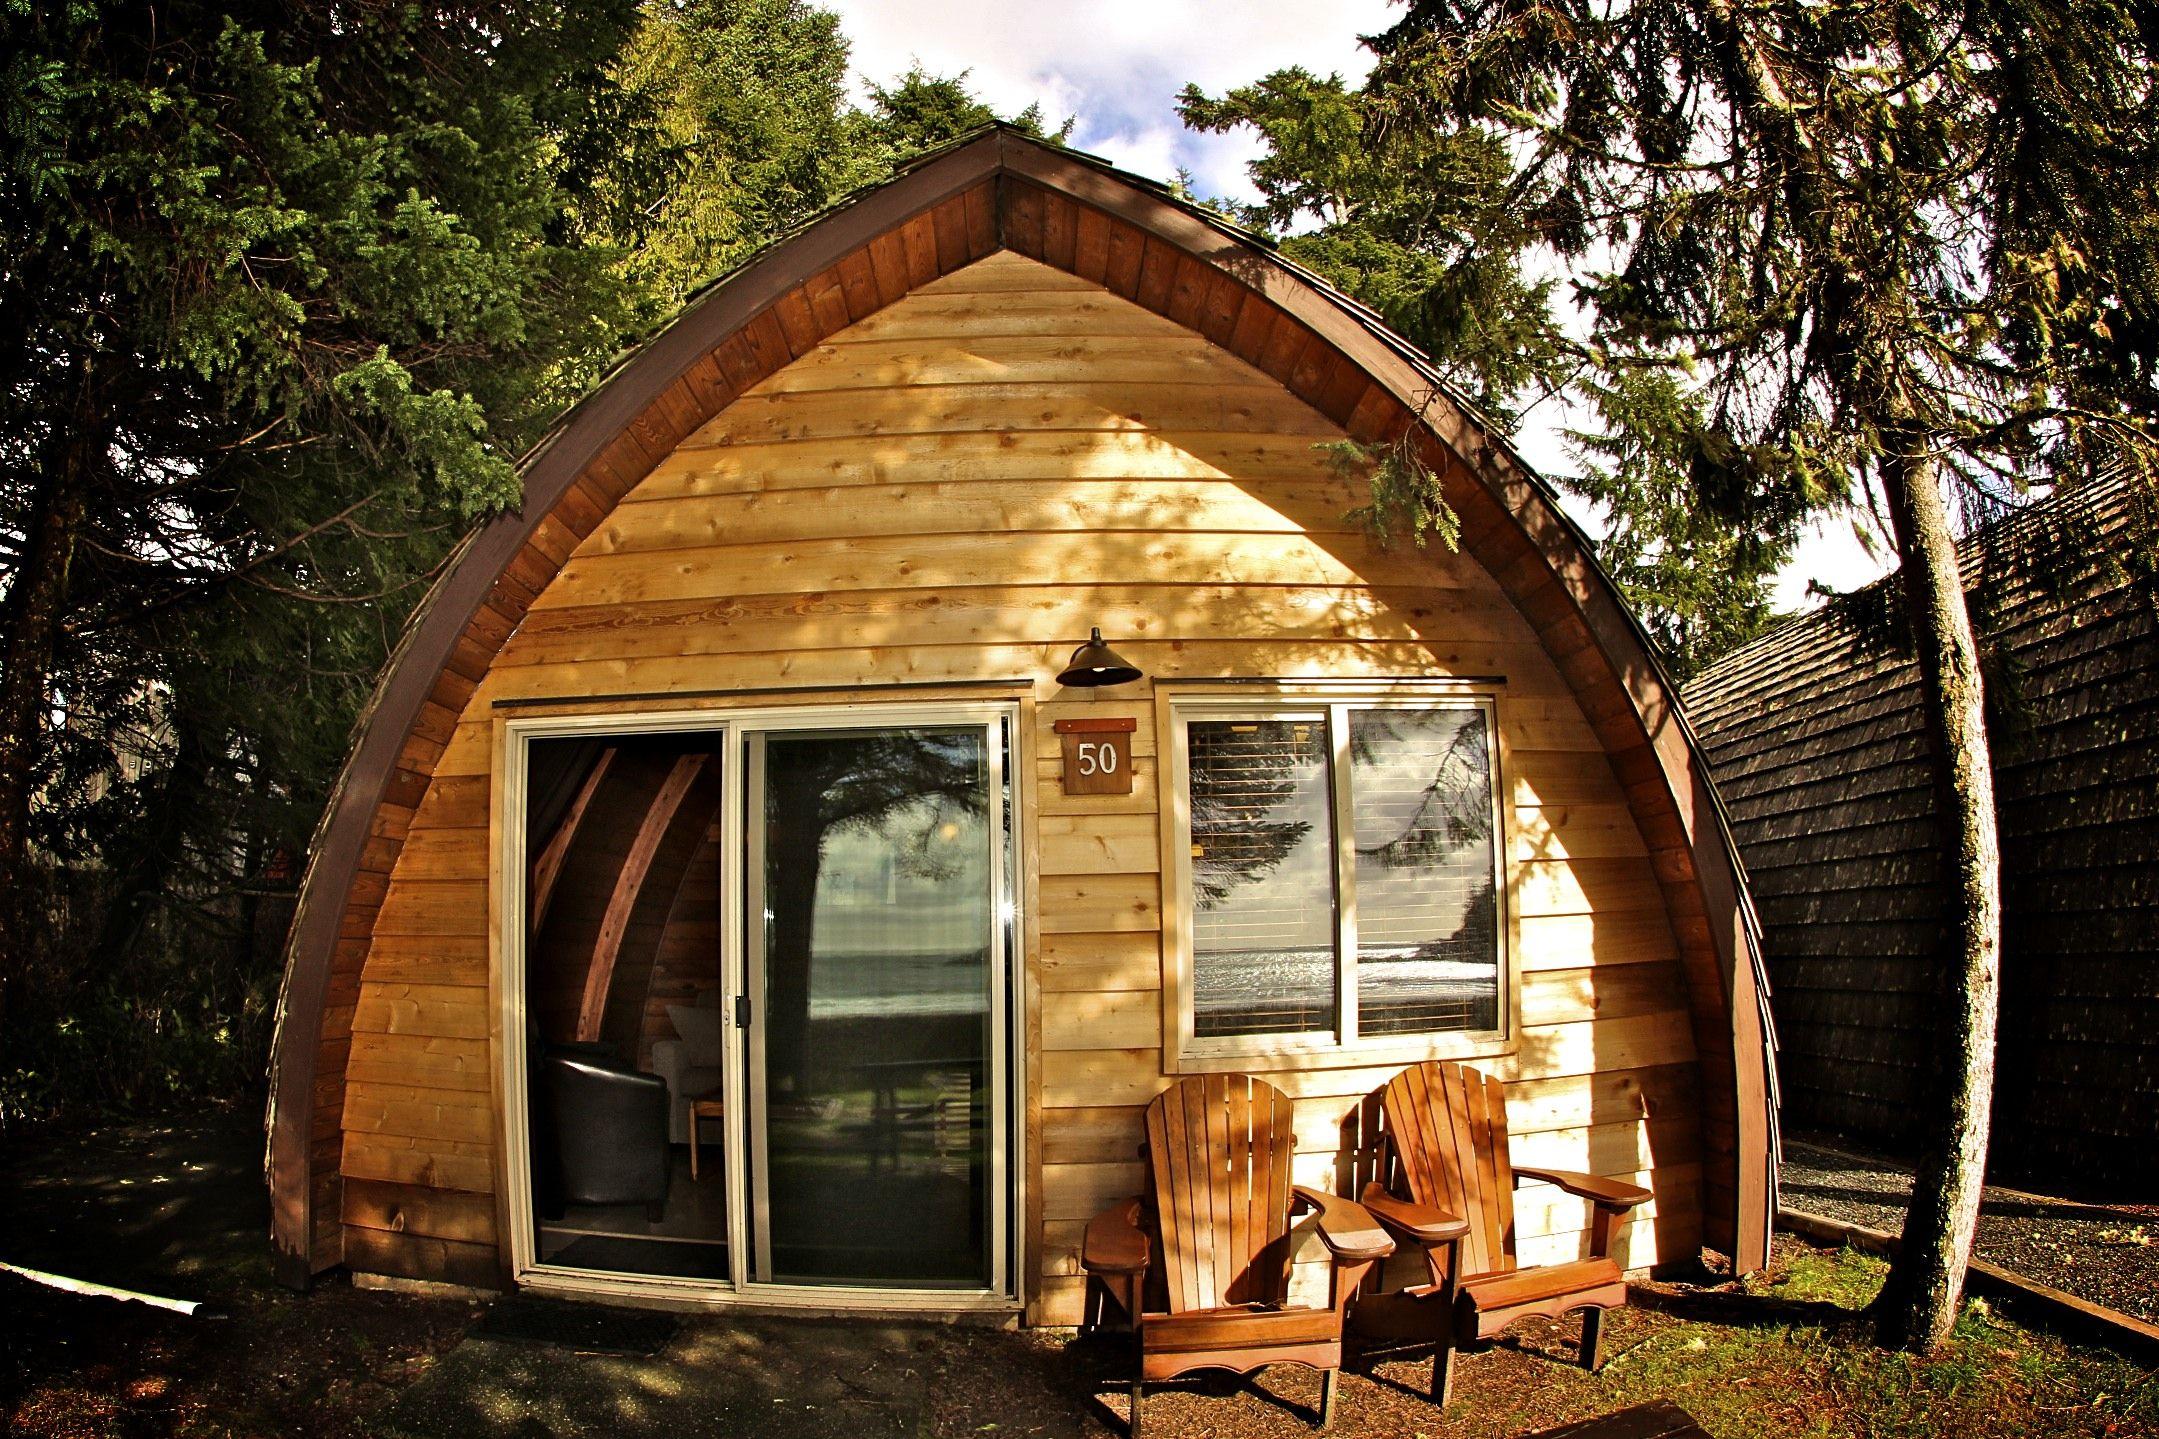 Pet friendly cabins in Tofino Beach cabin, Pet friendly